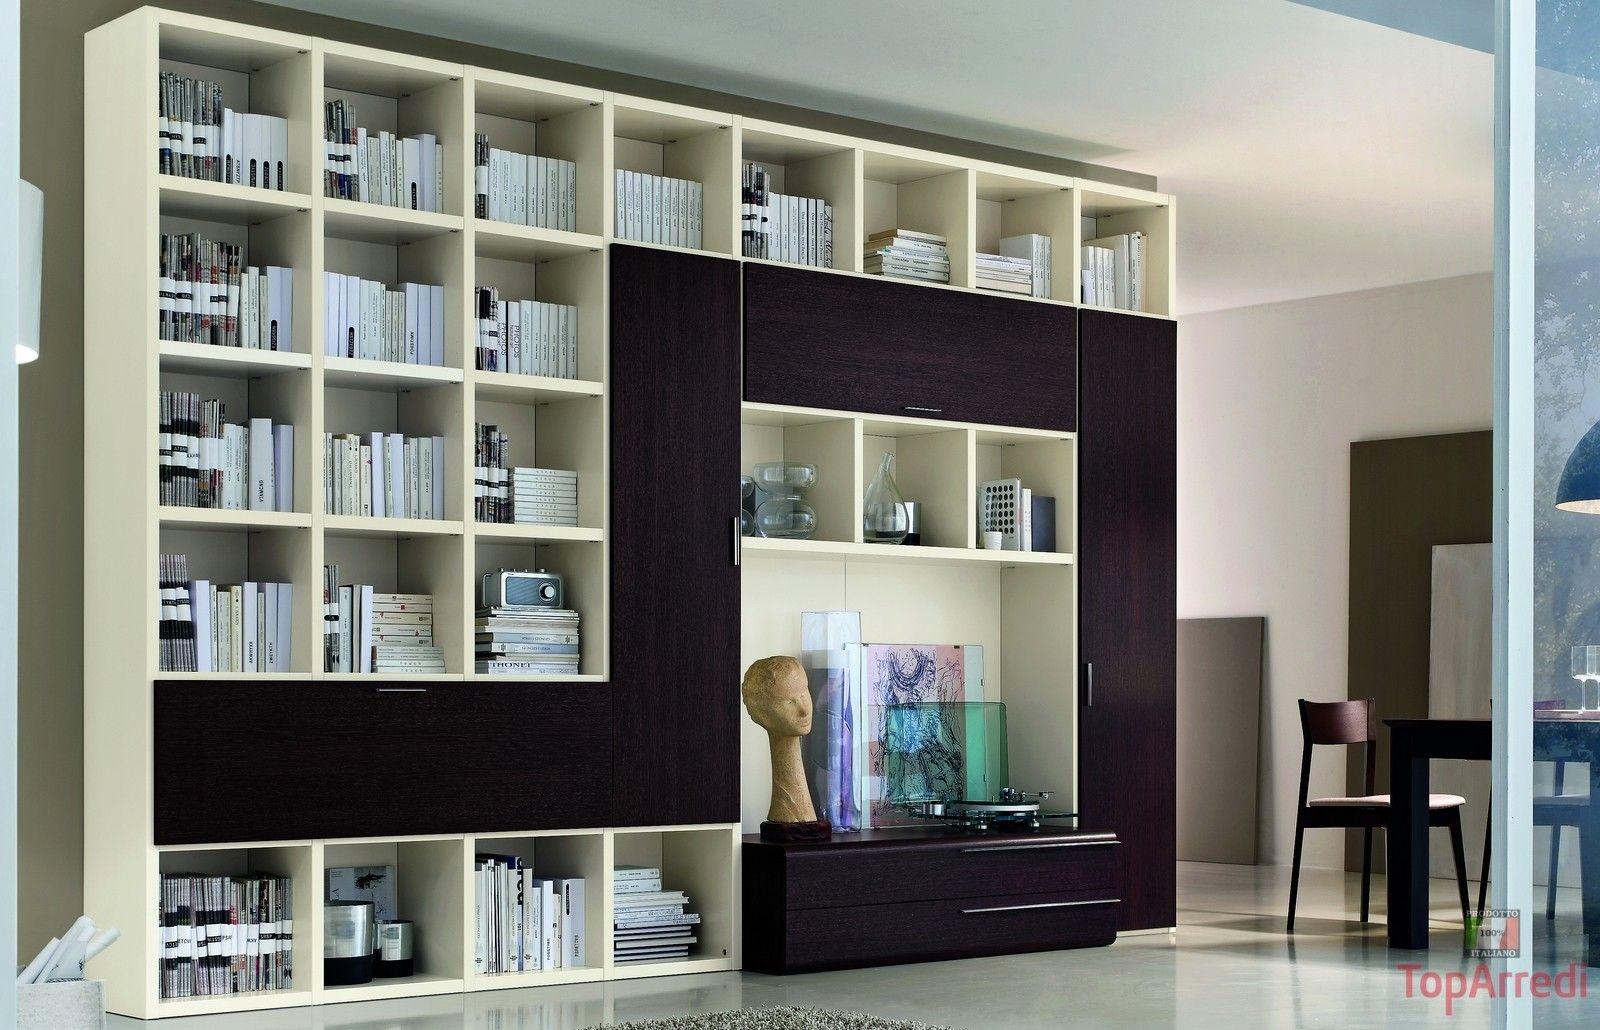 libreria-moderna-soggiorno-write.jpg (1600×1030) | Decor....Living ...